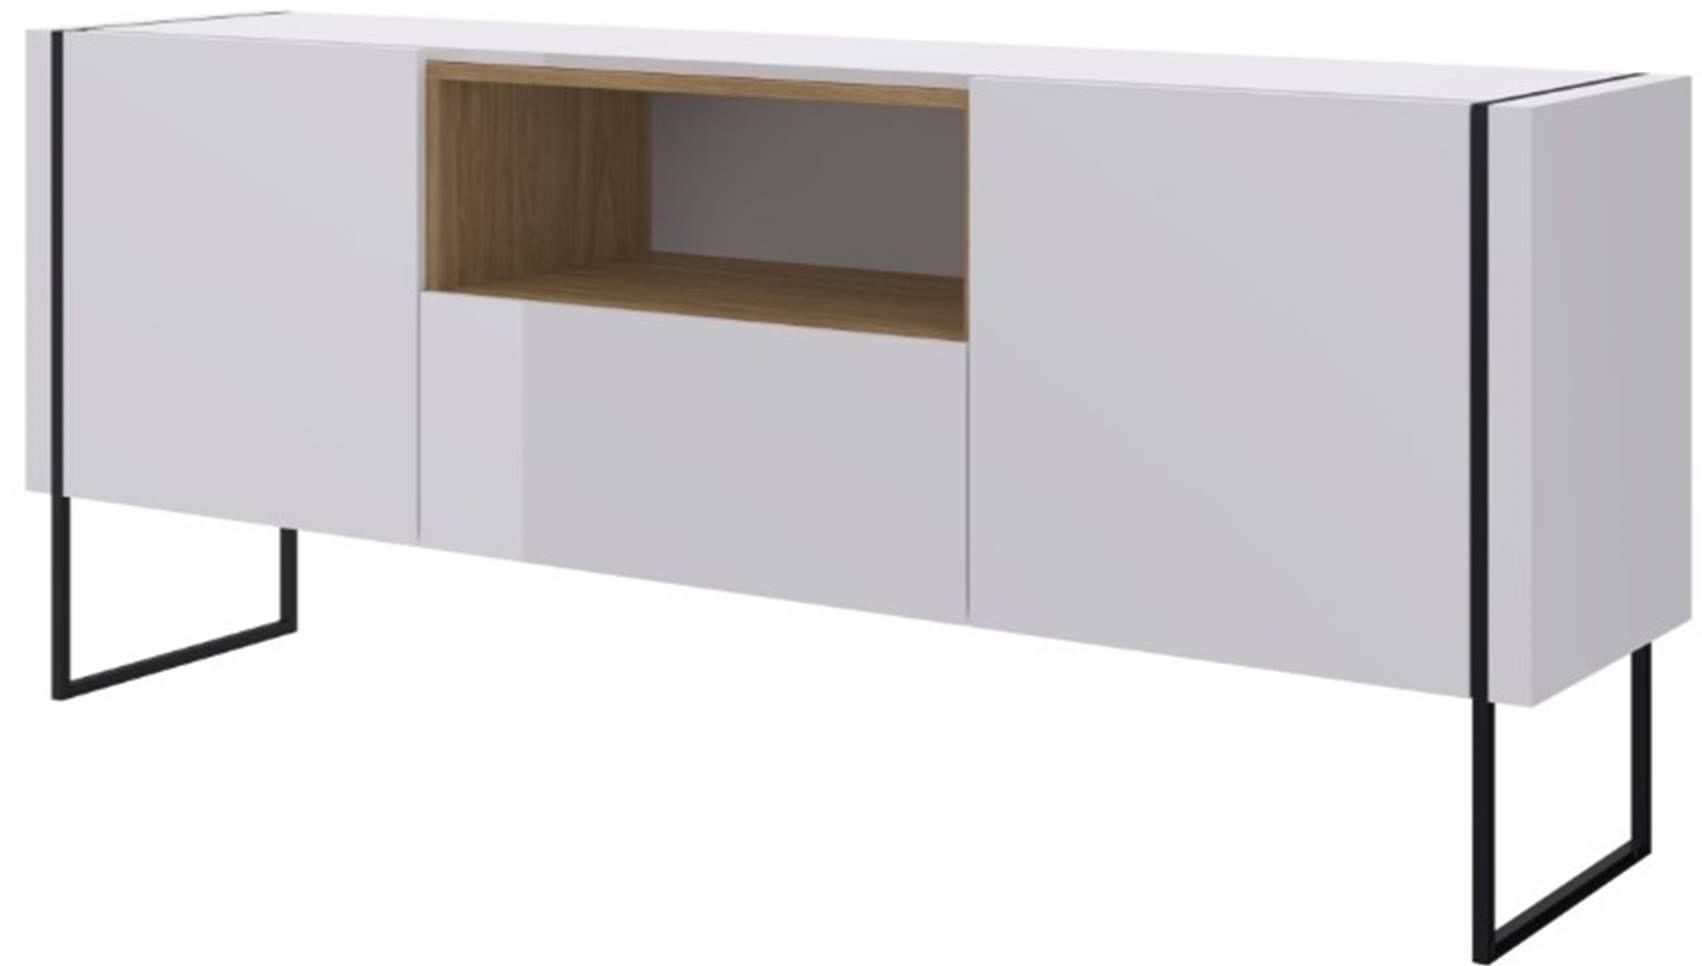 Buffet Radaelli Branco Estrutura Preta Acabamento Hanover 1470mm - 59165